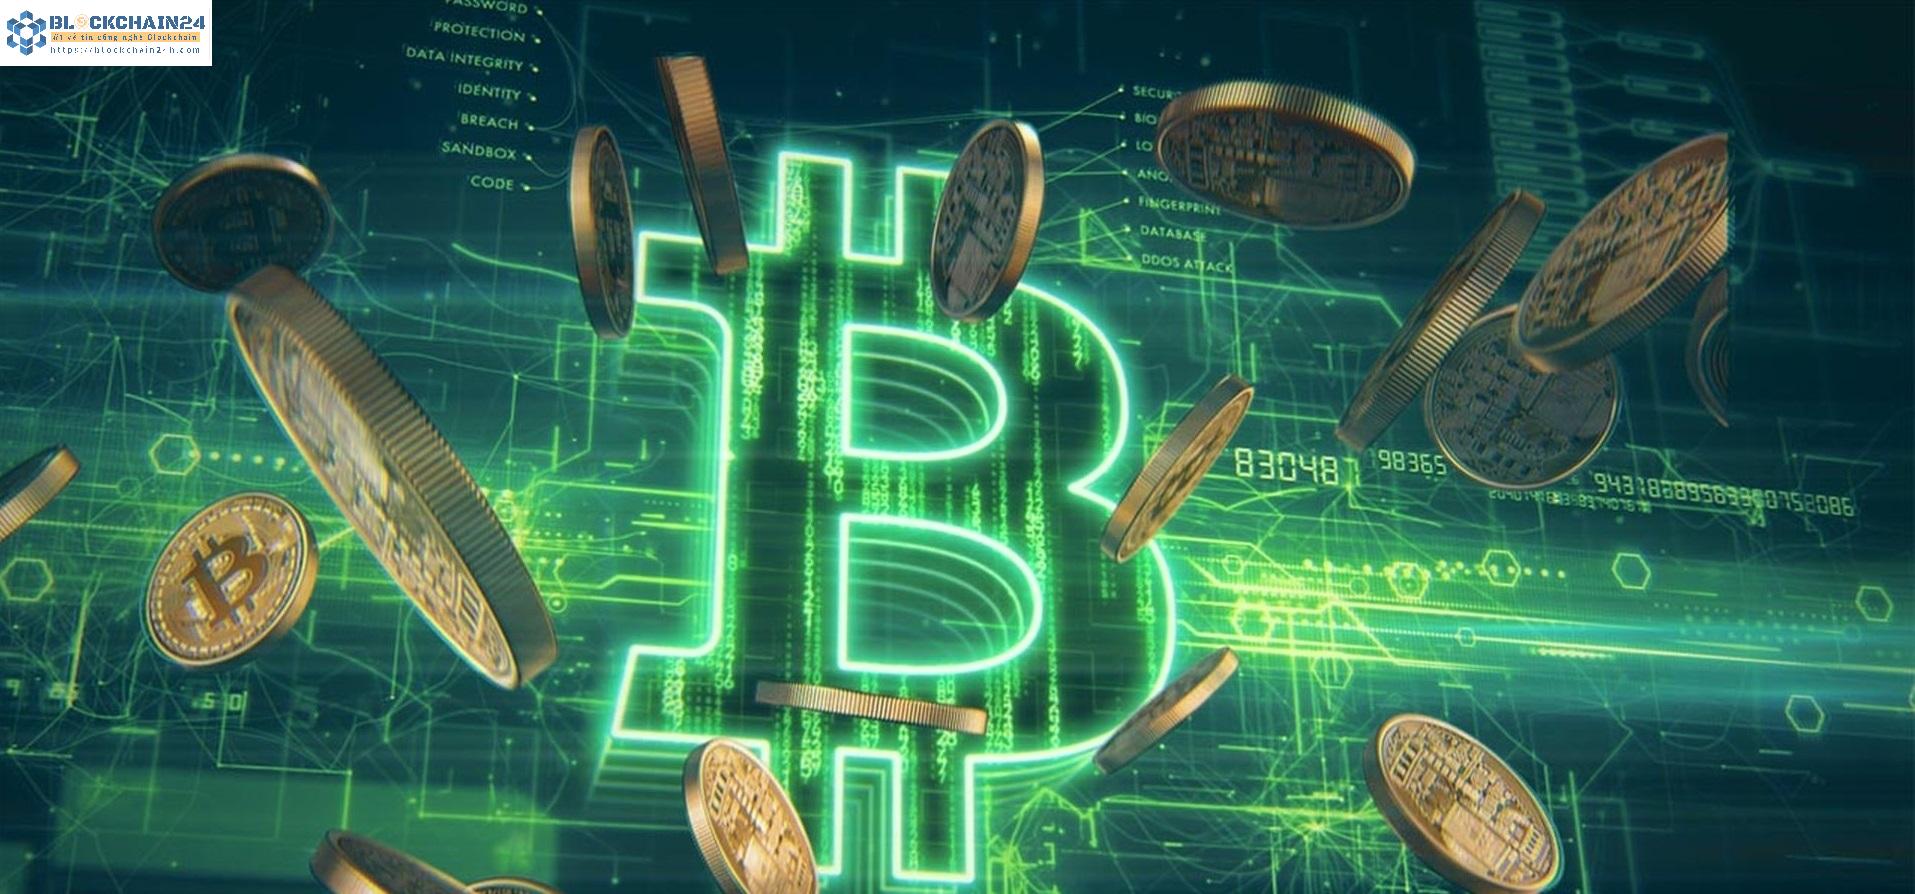 Tap chi bitcoin